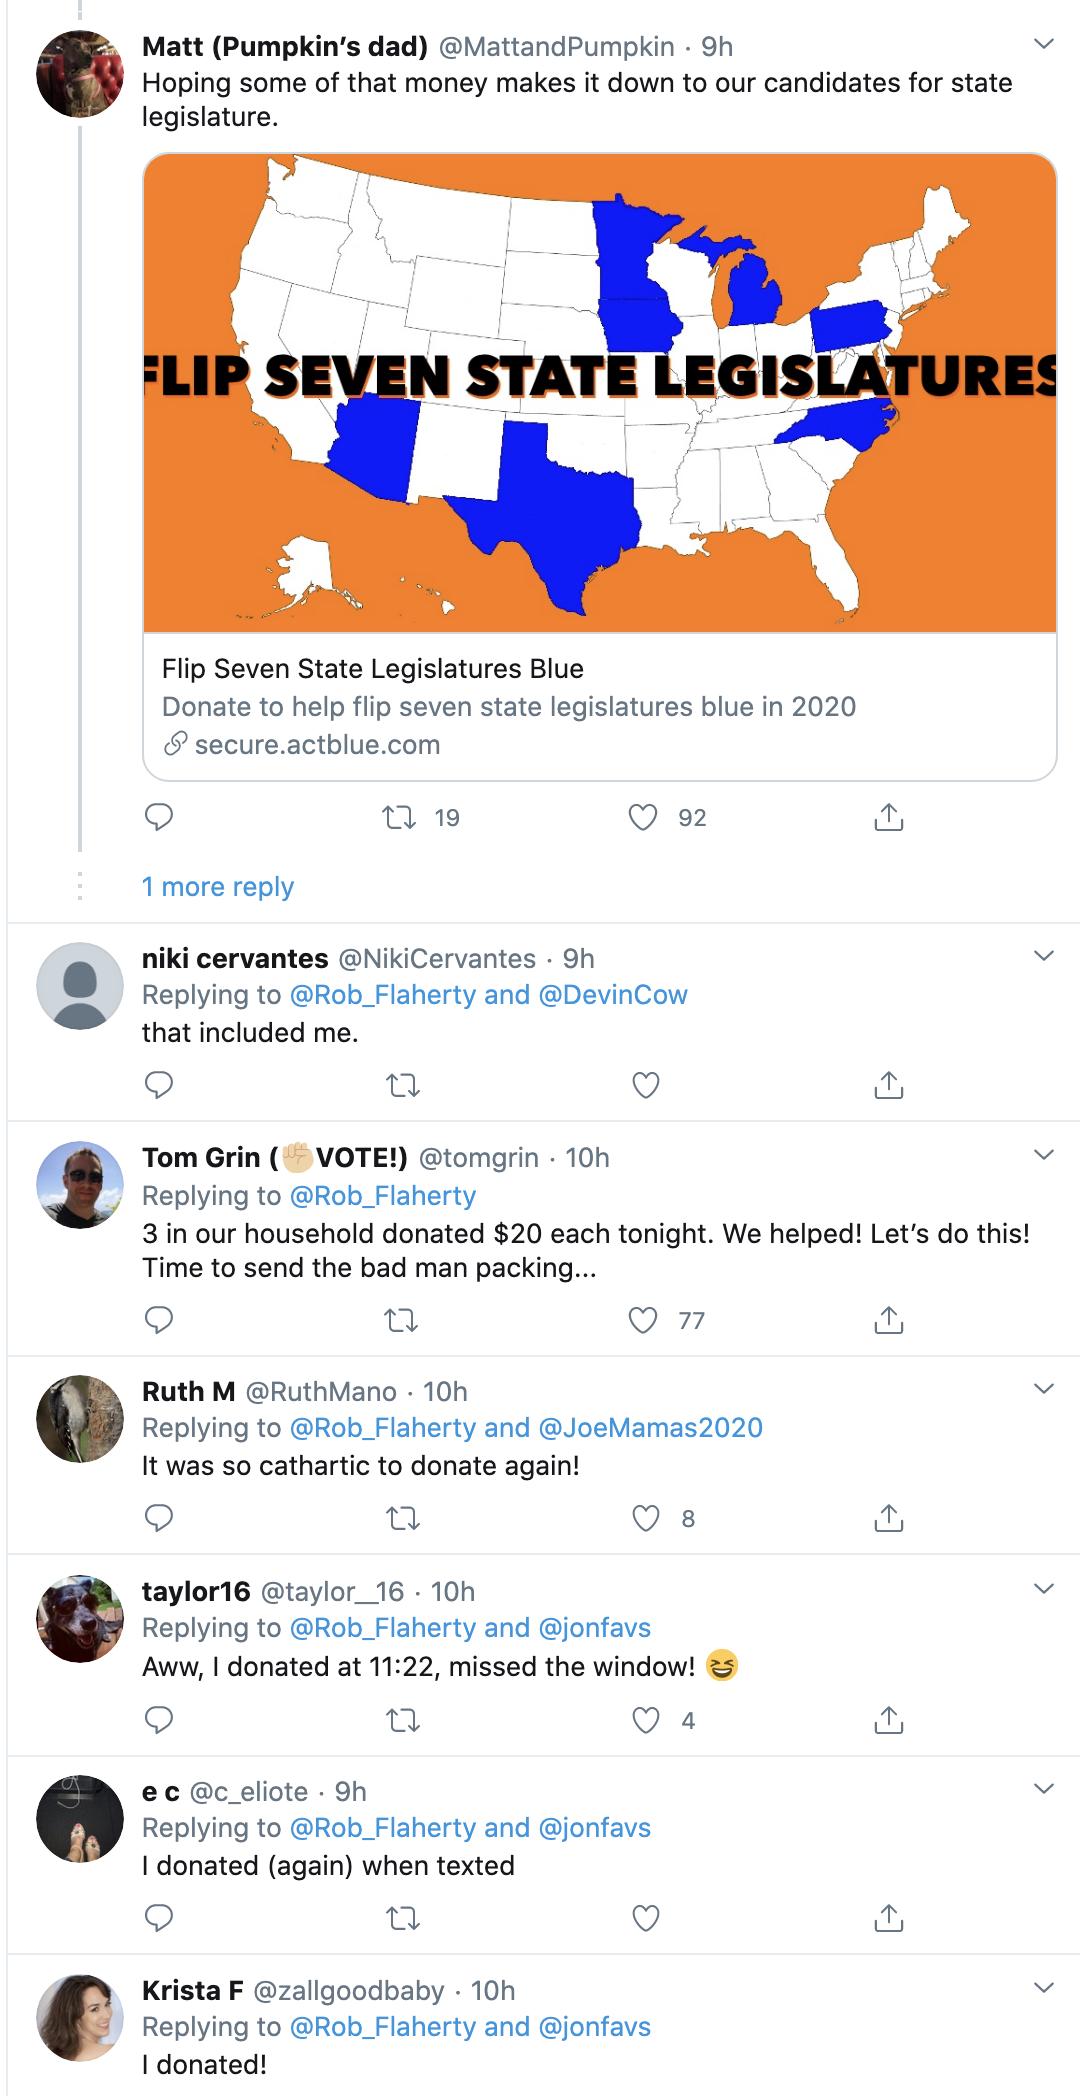 Screen-Shot-2020-09-30-at-9.12.38-AM Trump Terrified After Biden Raises Astronomical Amount Of Cash Post-Debate Corruption Election 2020 Featured Politics Top Stories